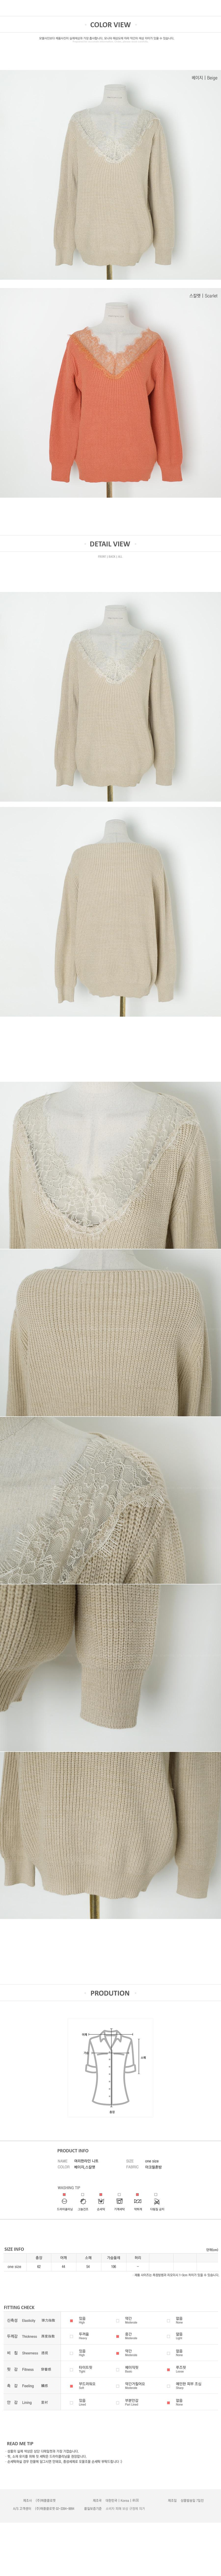 Reasonable line knit